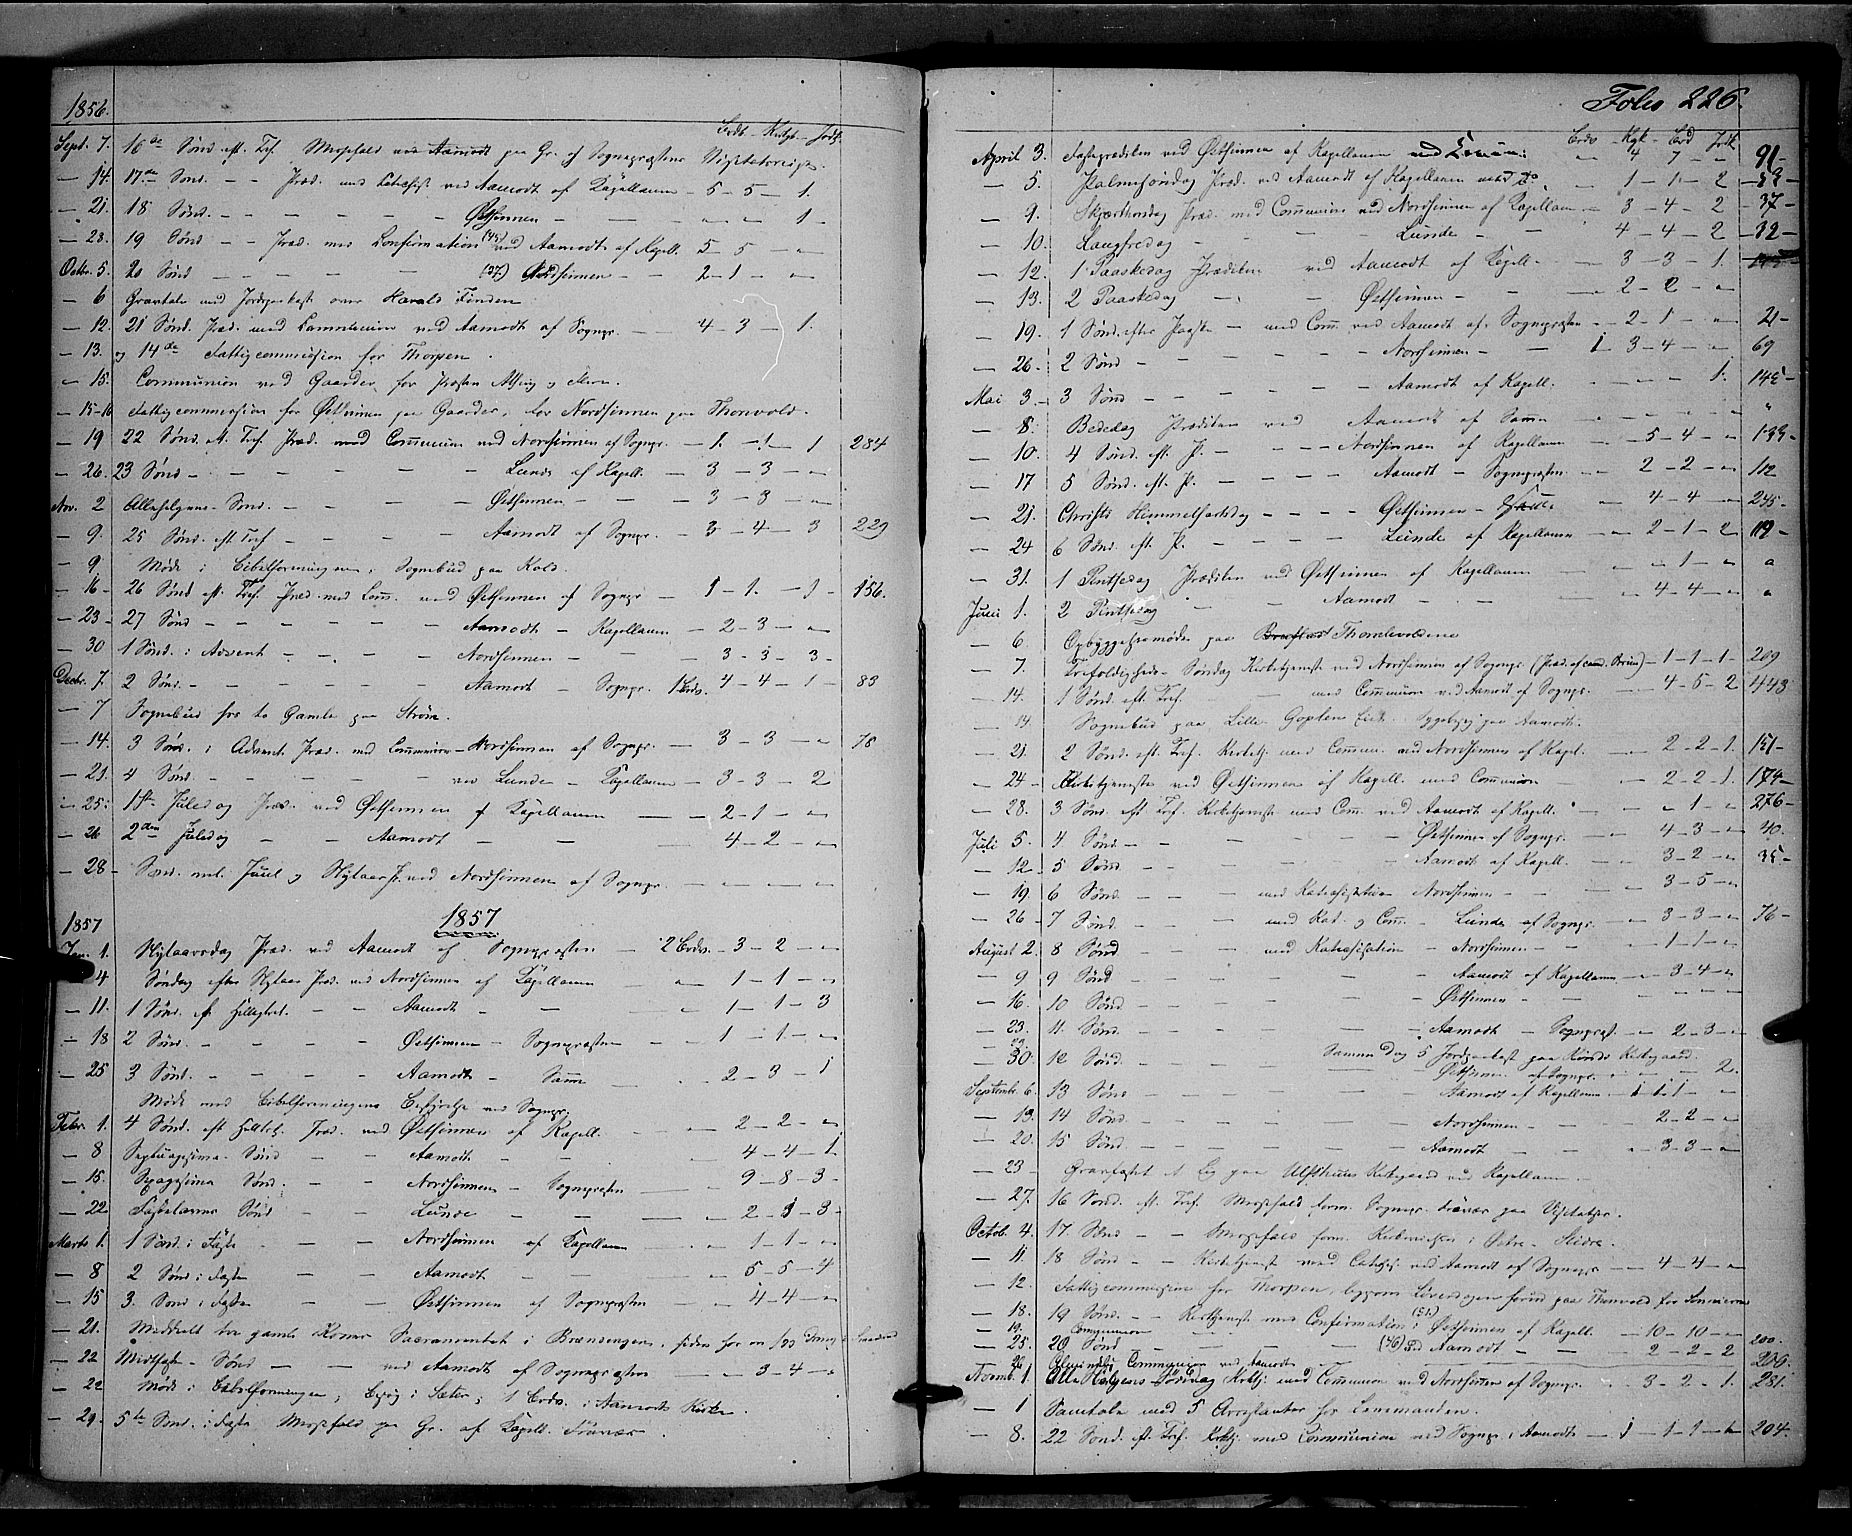 SAH, Land prestekontor, Ministerialbok nr. 10, 1847-1859, s. 226